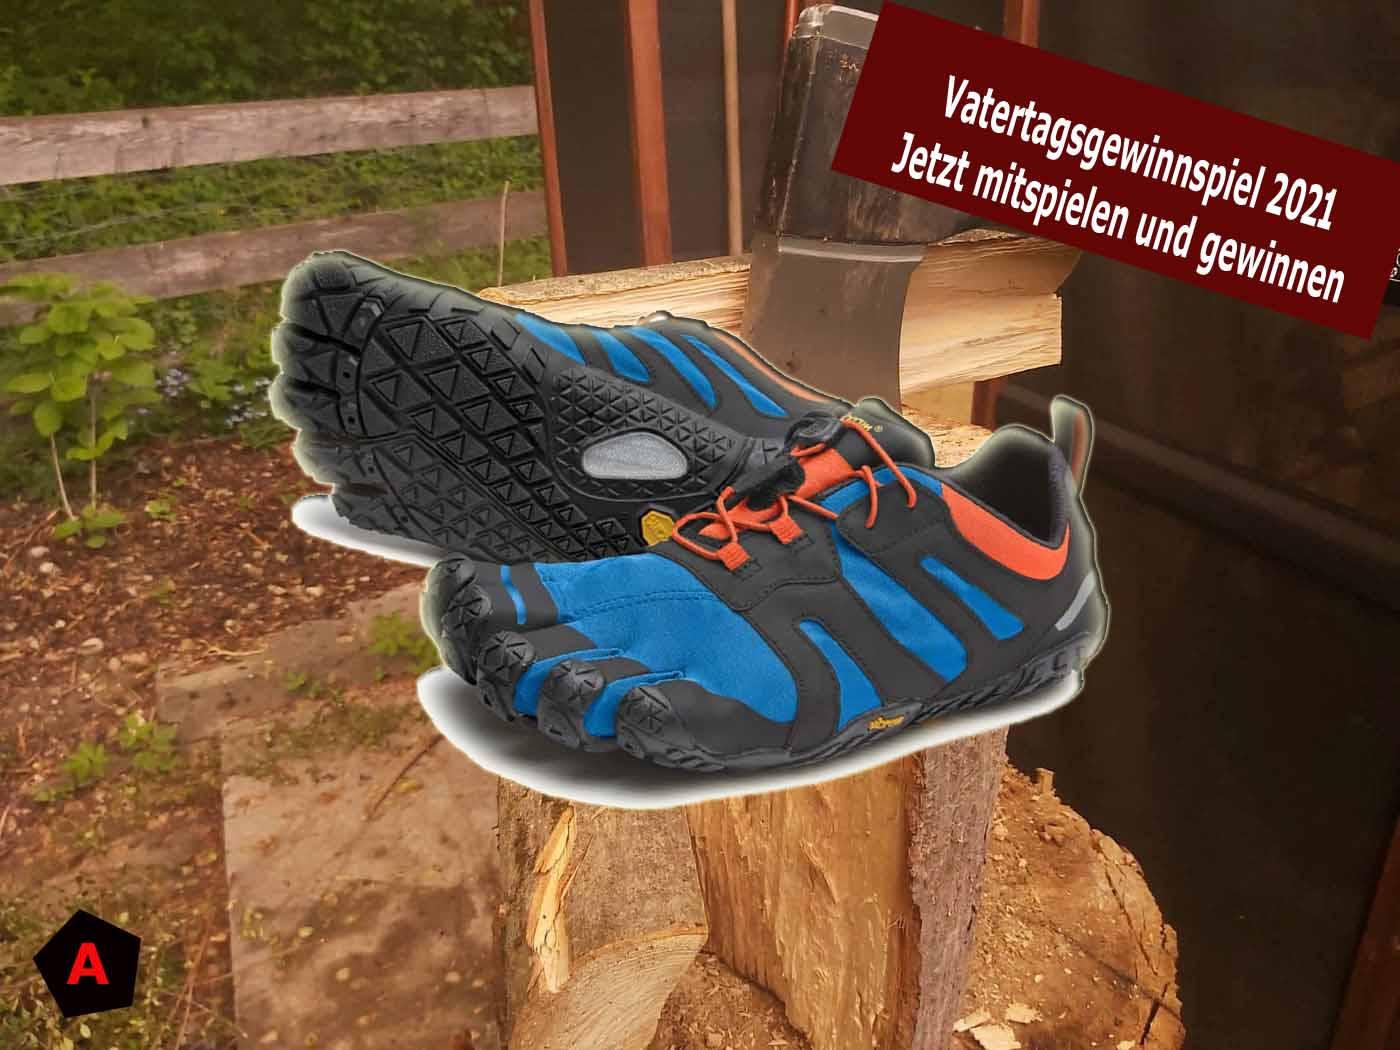 (c)be-outdoor.de Vatertagsgewinnspiel Vibram Five Fingers V2-Trail2